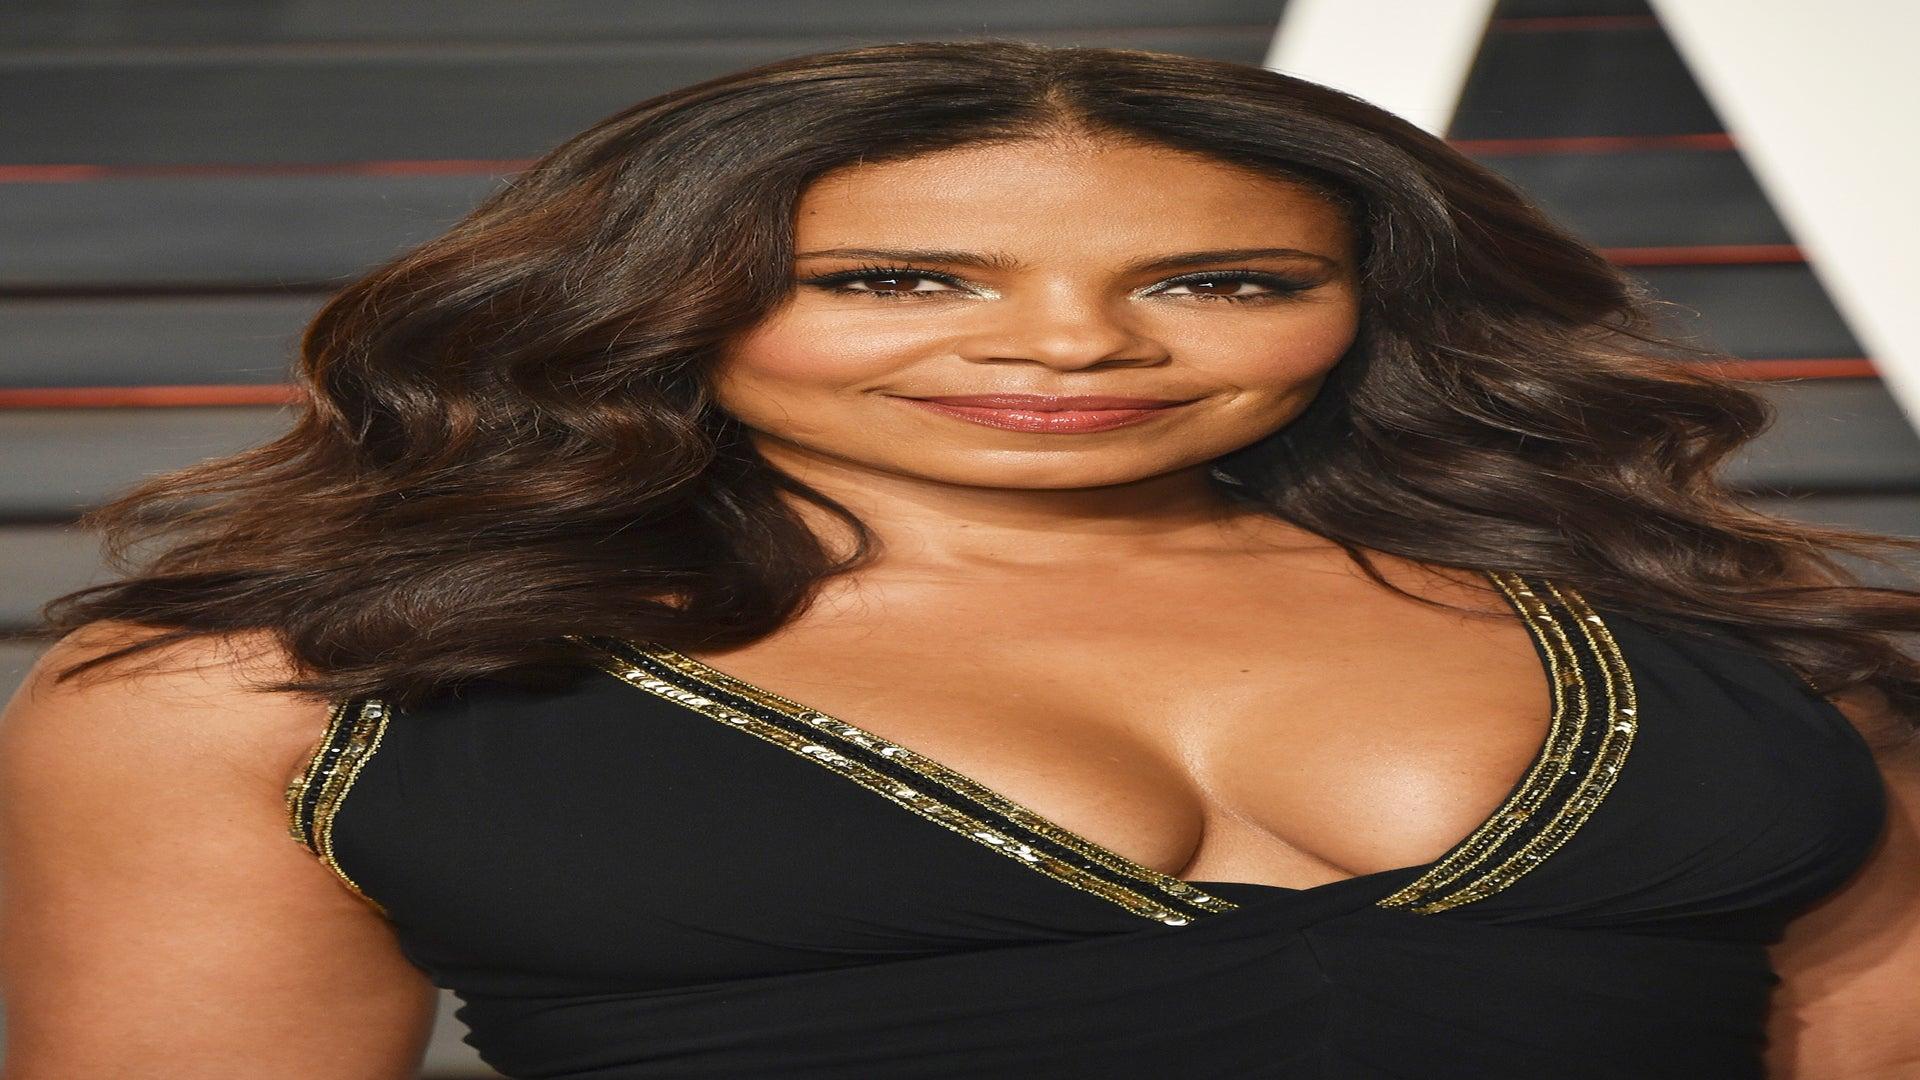 27 Beautiful Celebrity Women Who Seem To Be Aging Backwards